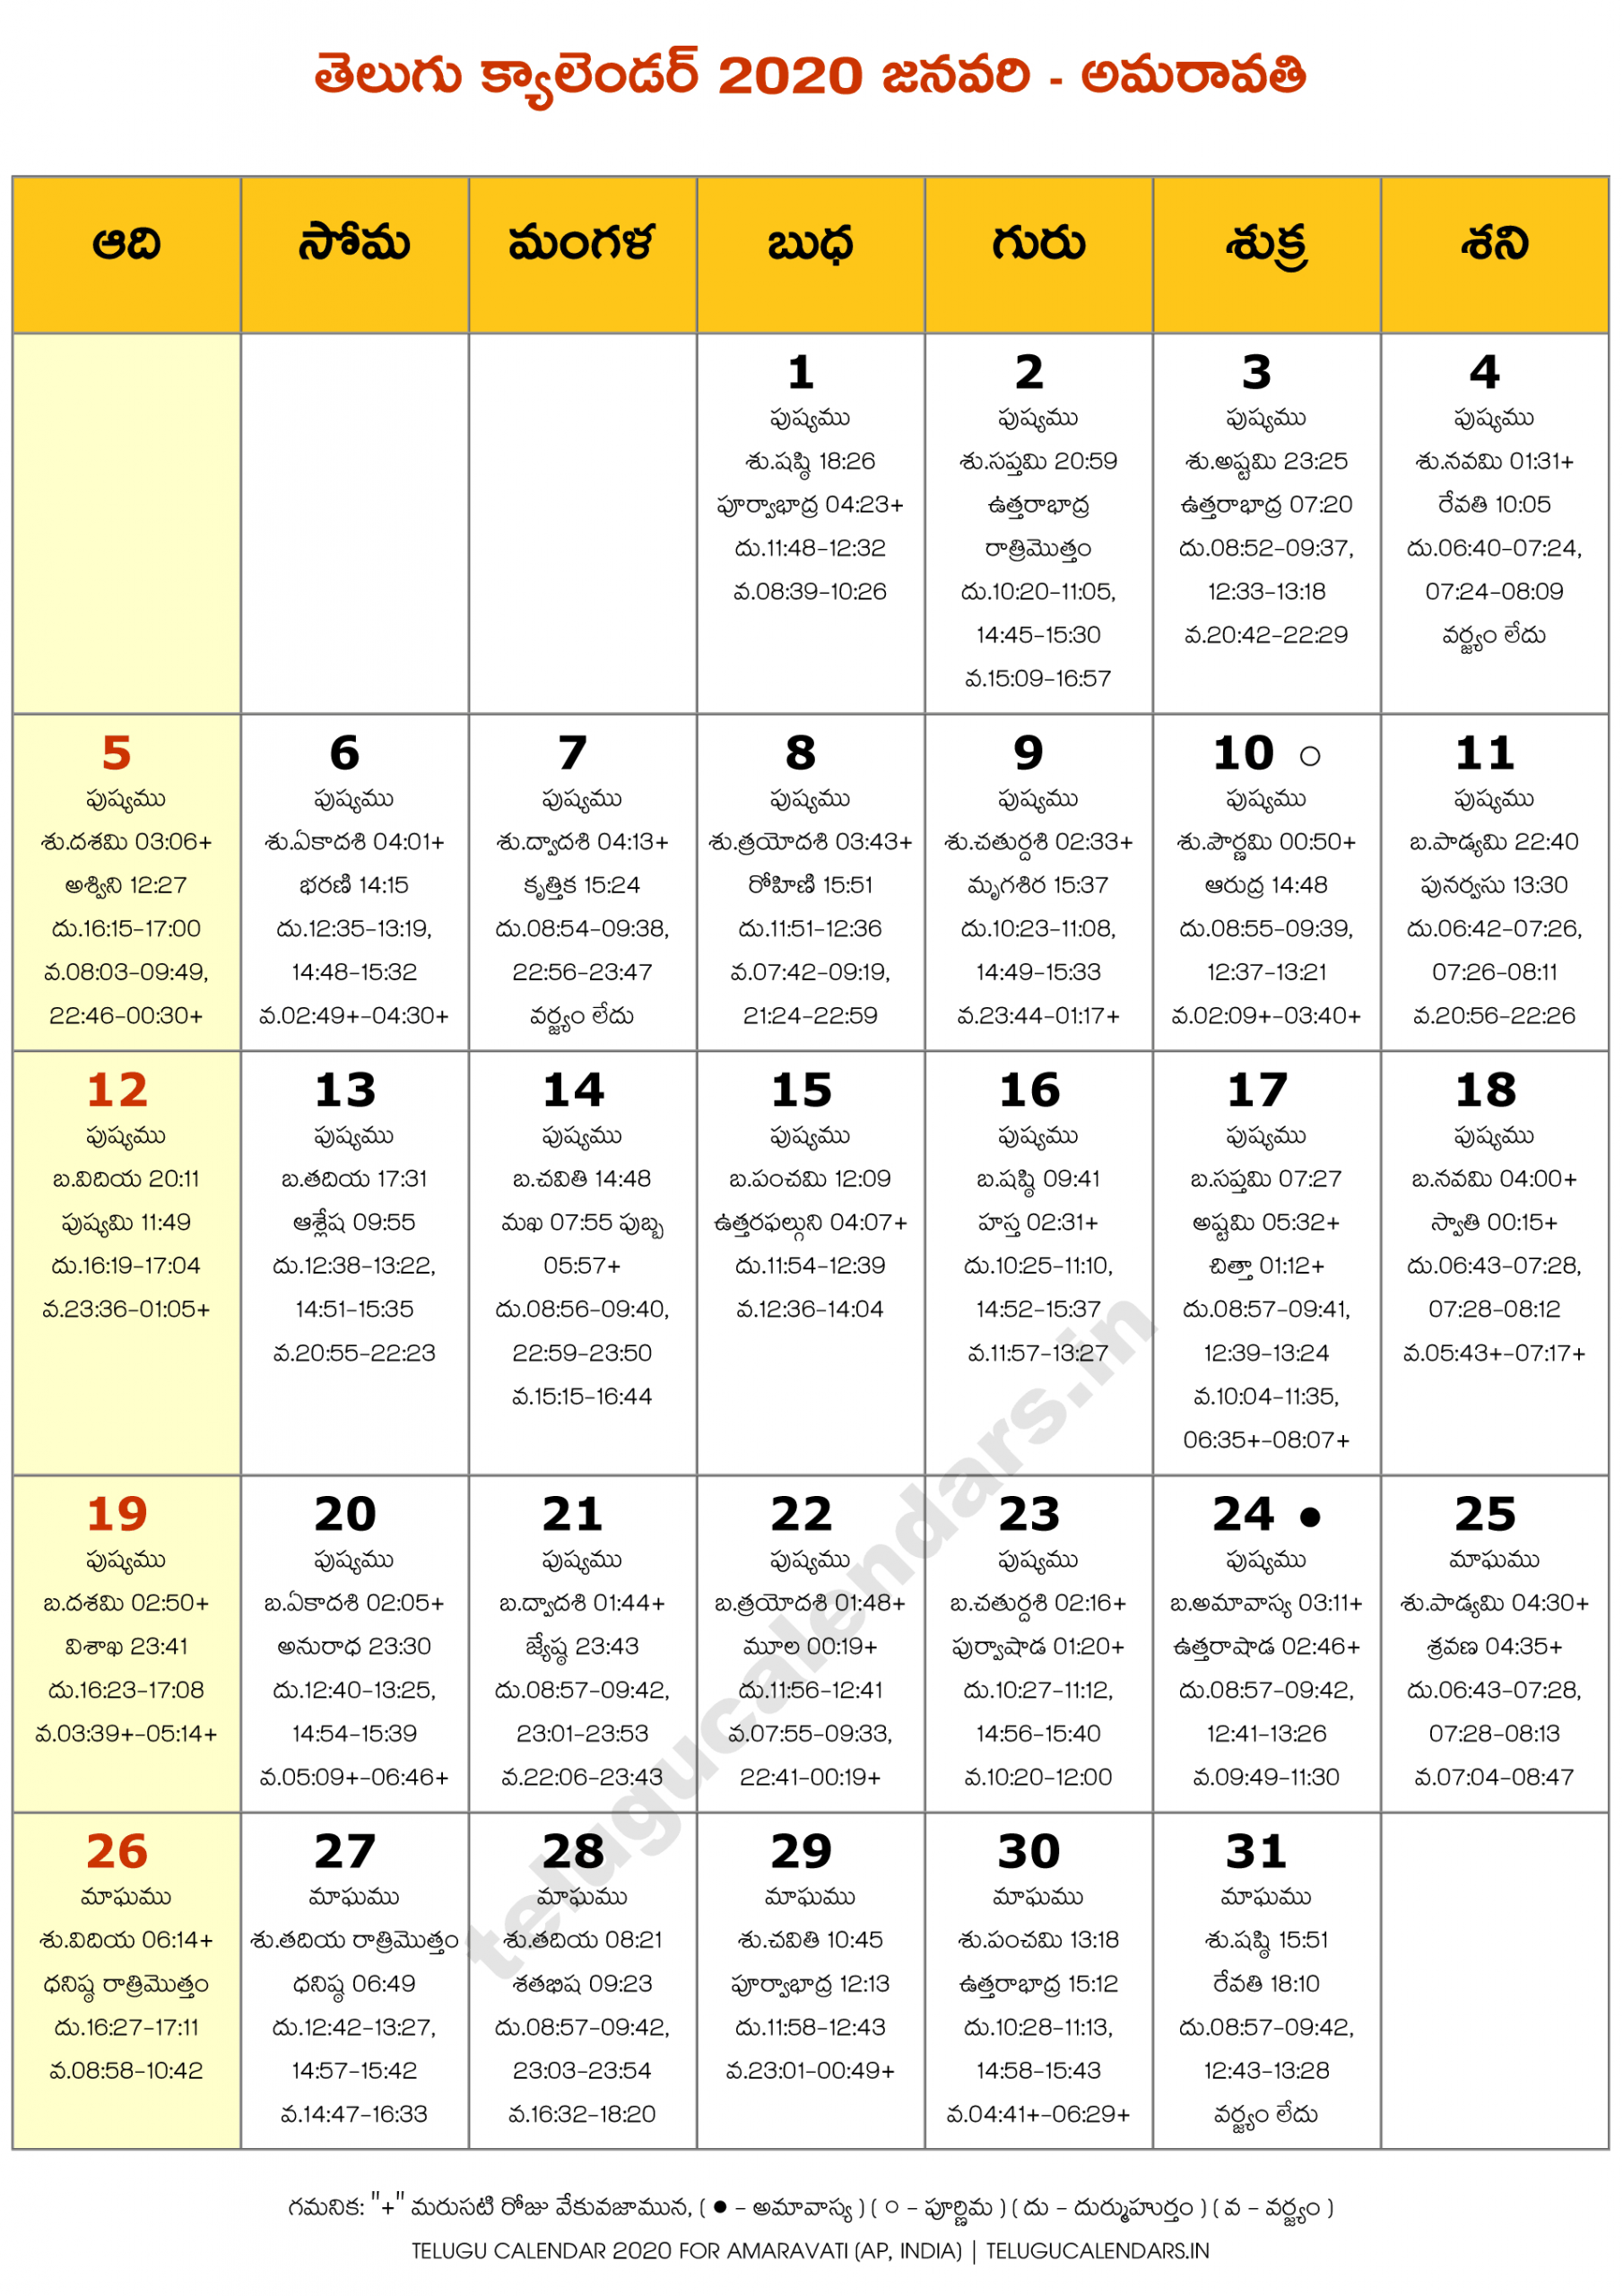 Amaravati 2020 January Telugu Calendar | Telugu Calendars